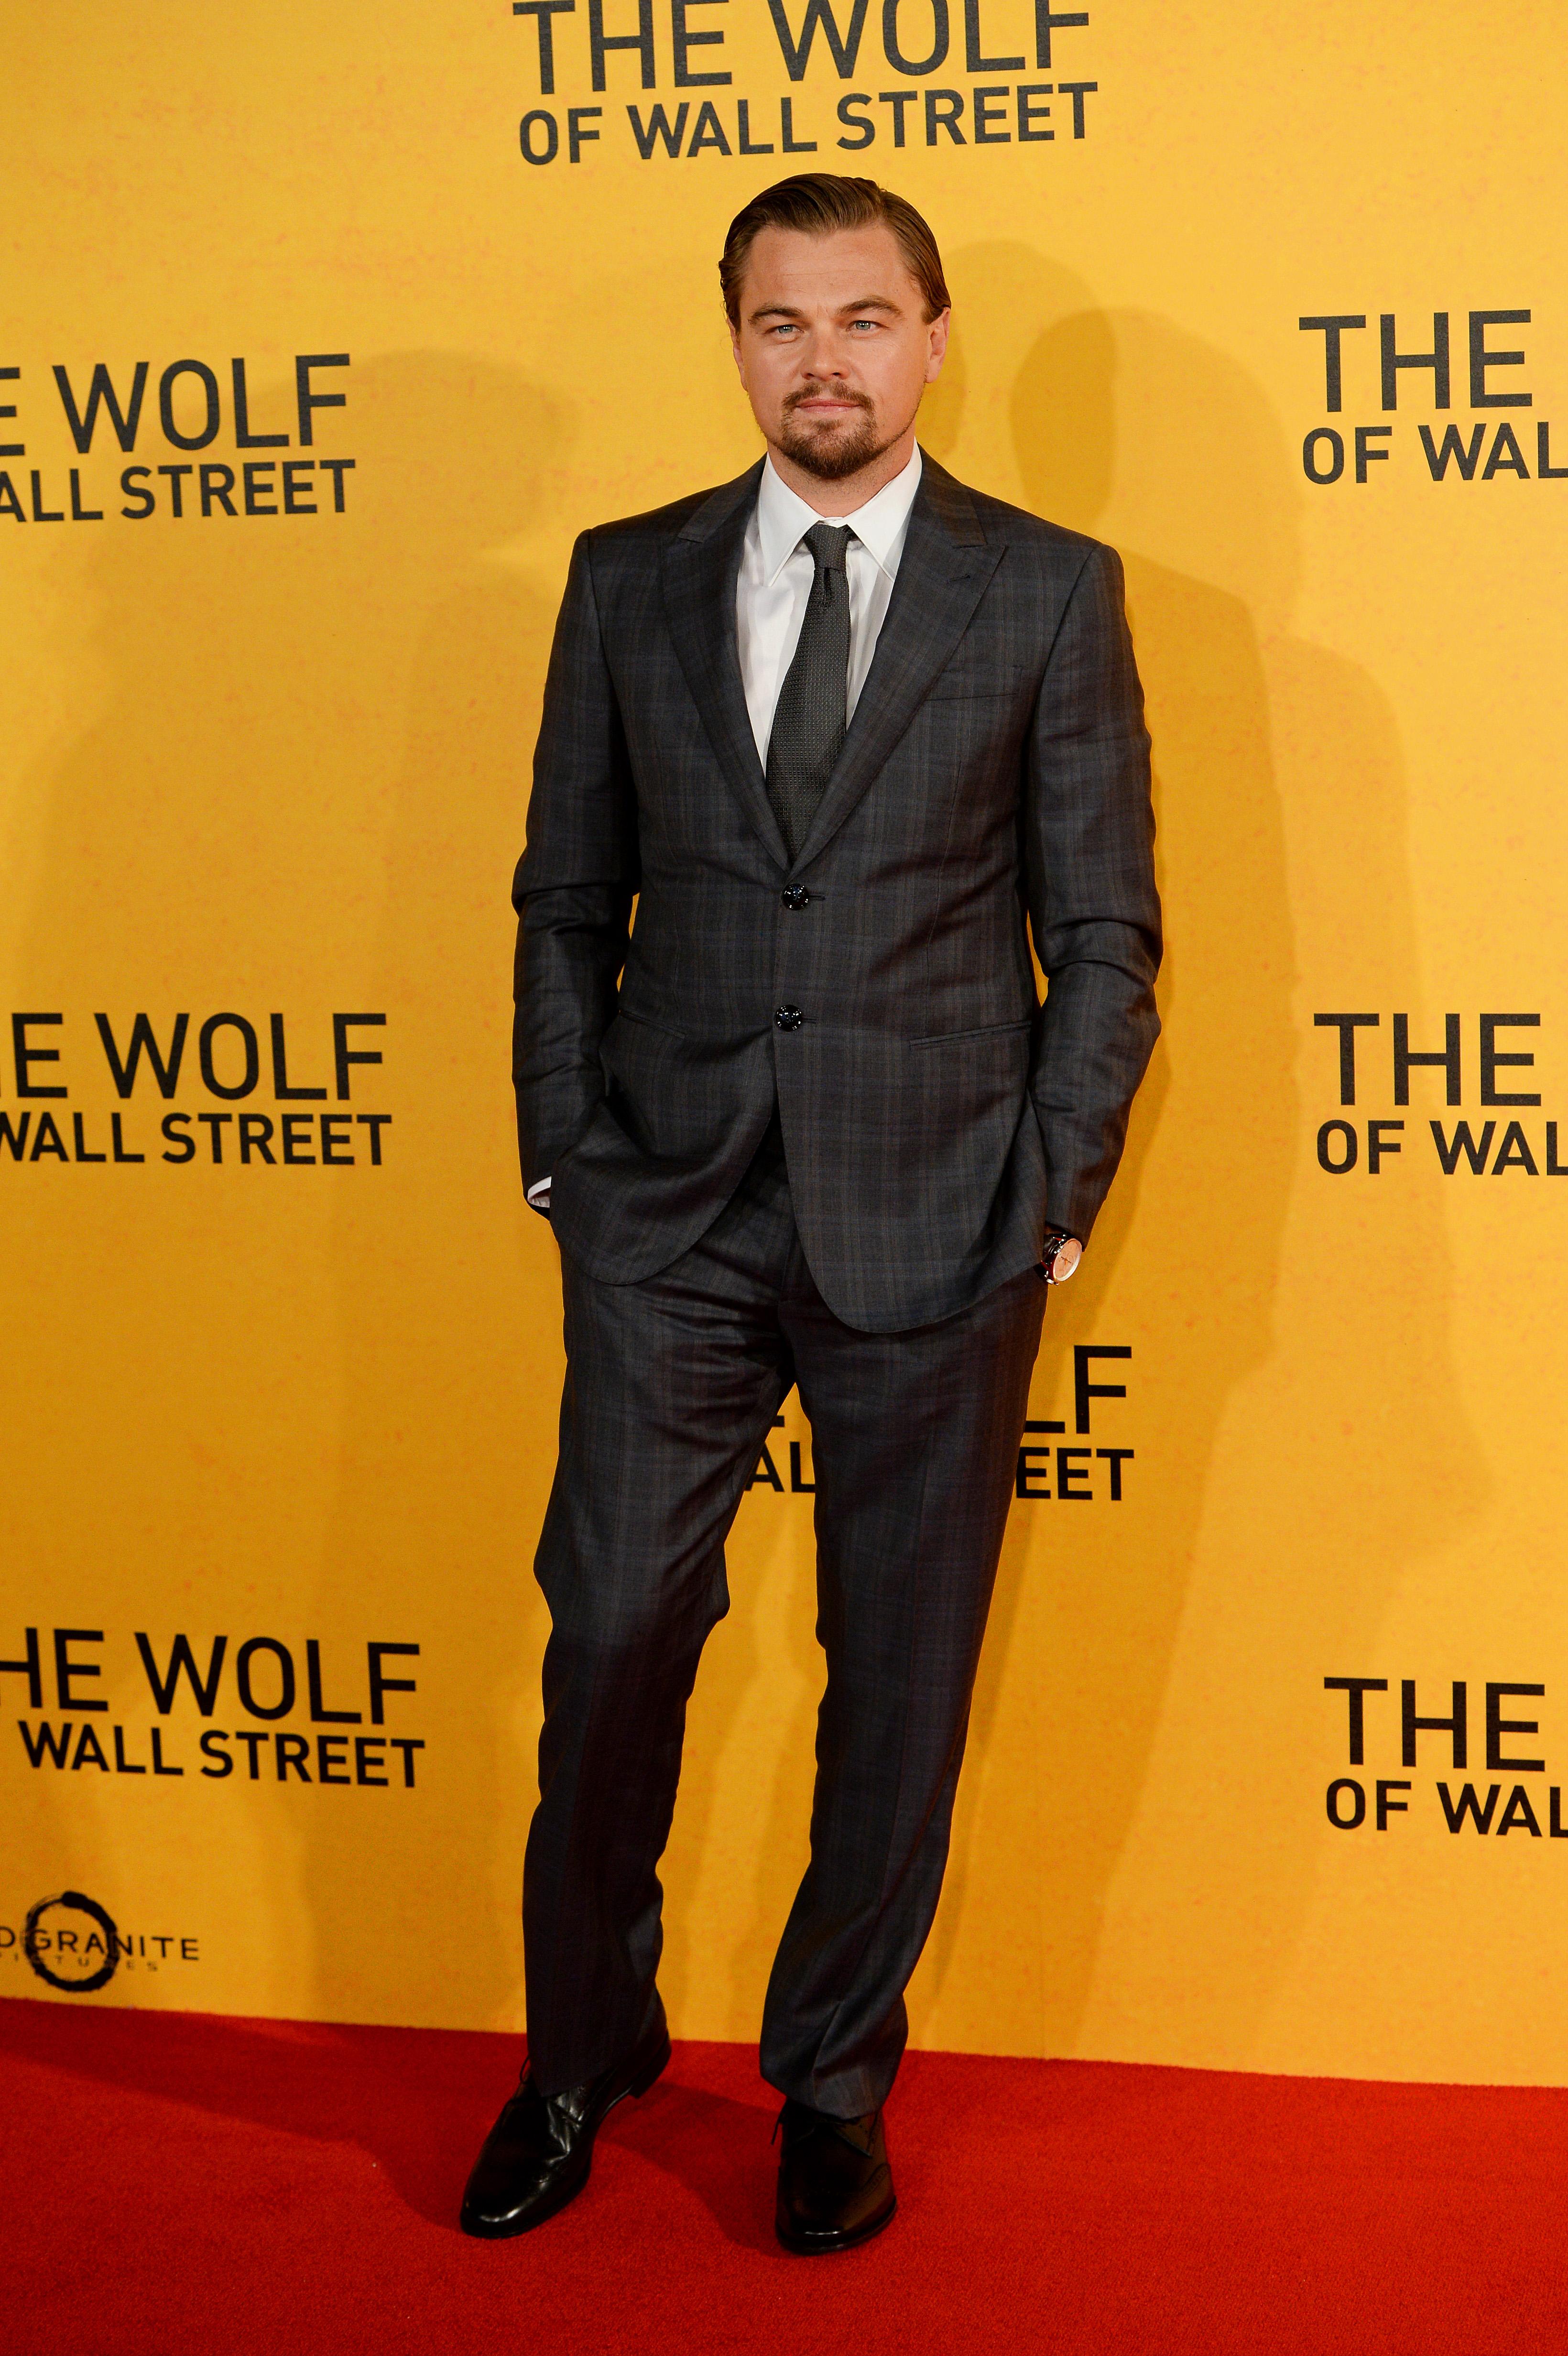 7 Leonardo DiCaprio Roles You Won't Believe the Academy Snubbed